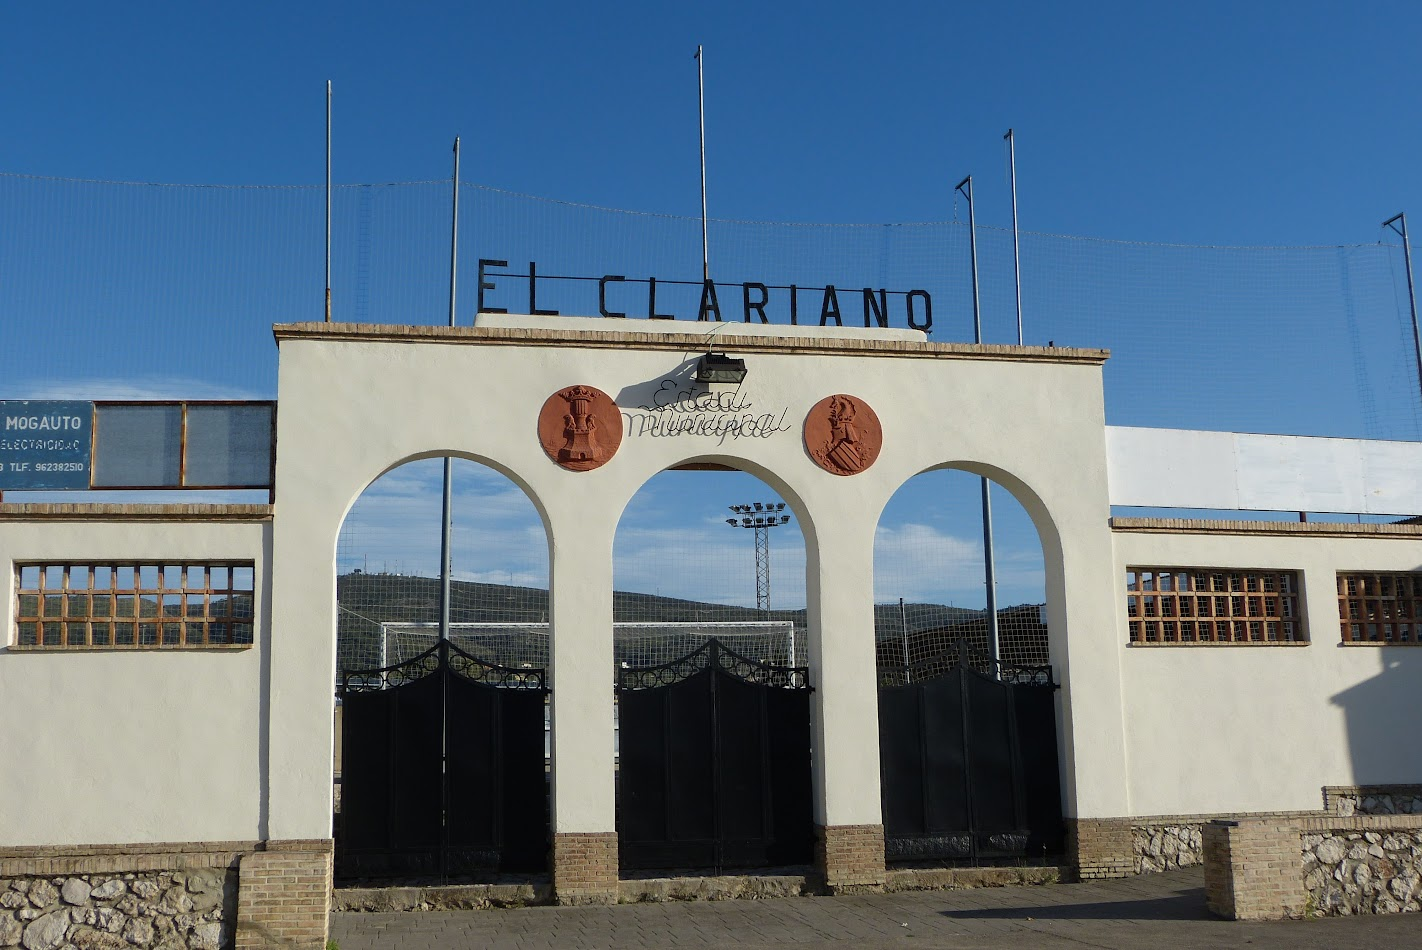 Ontinyent CF El Clariano